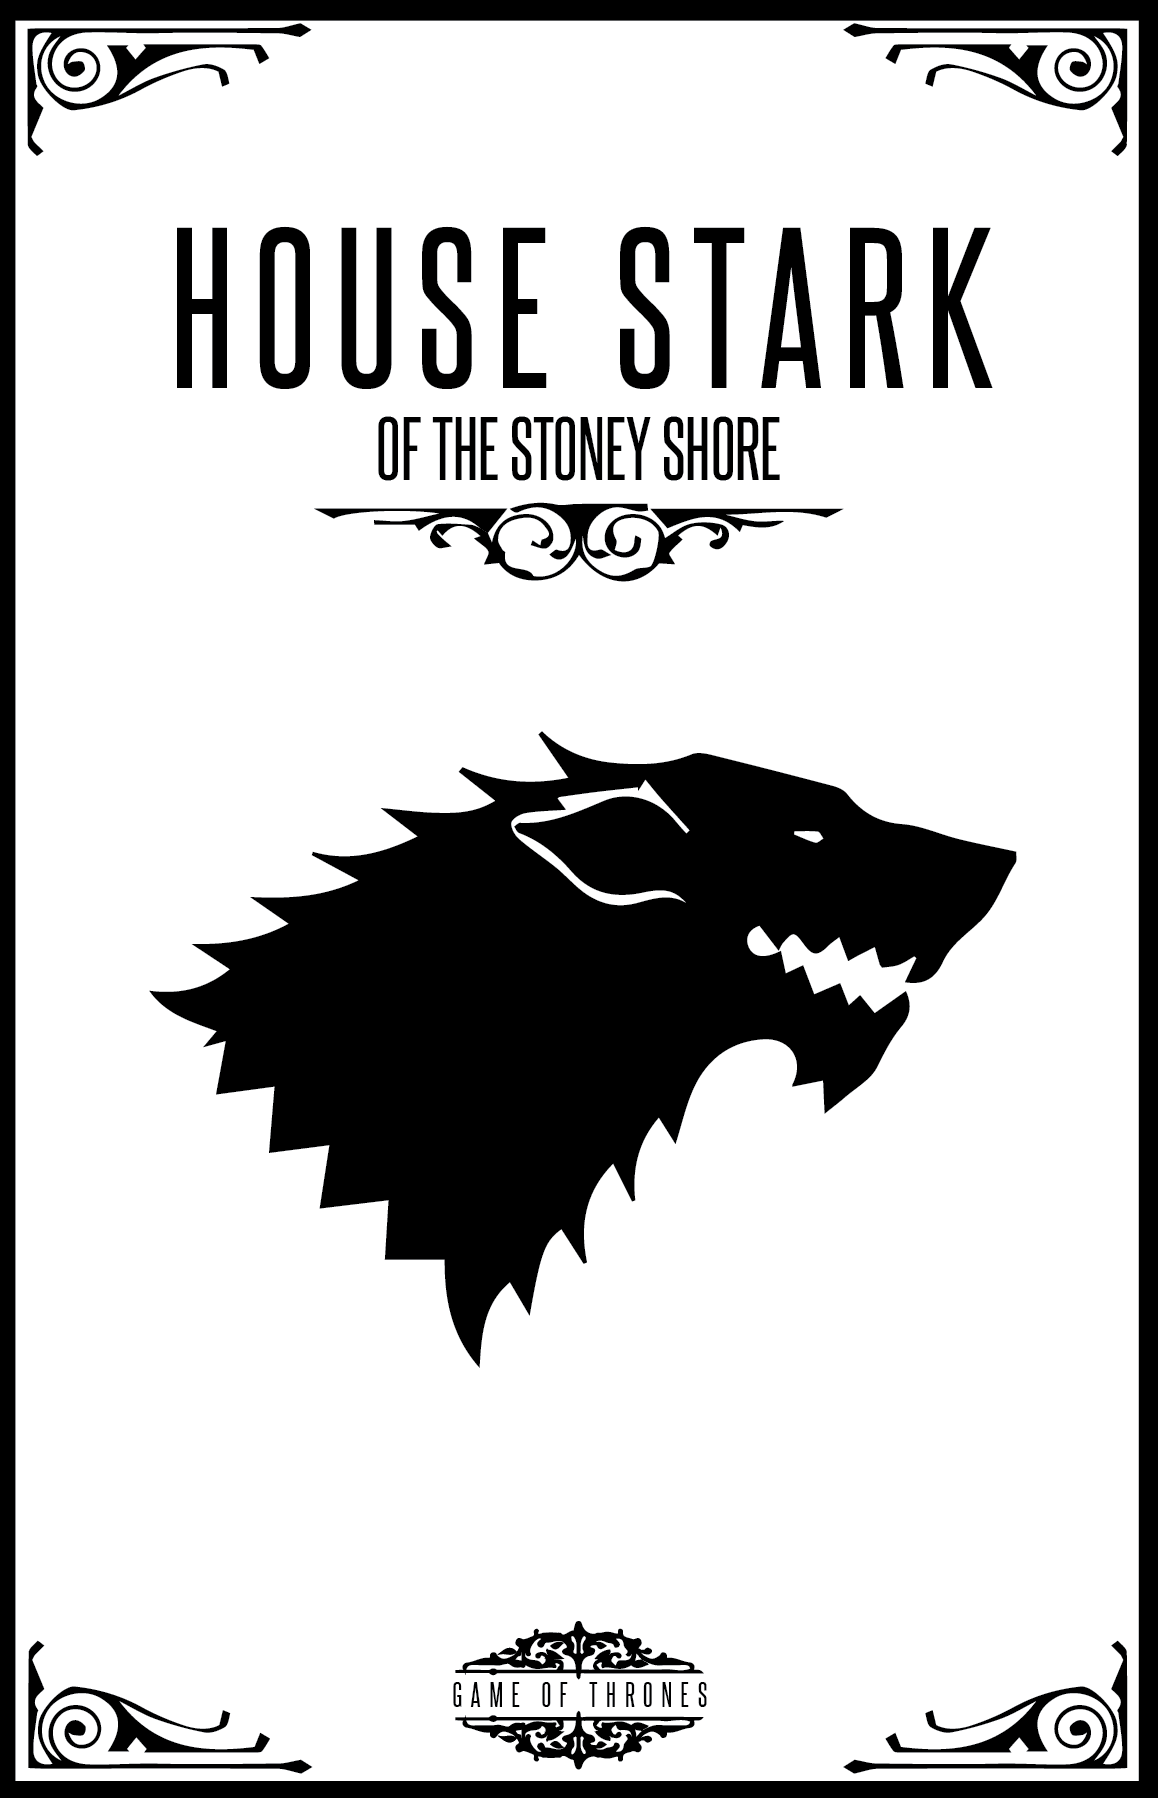 House Stark Of The Stoney Shore